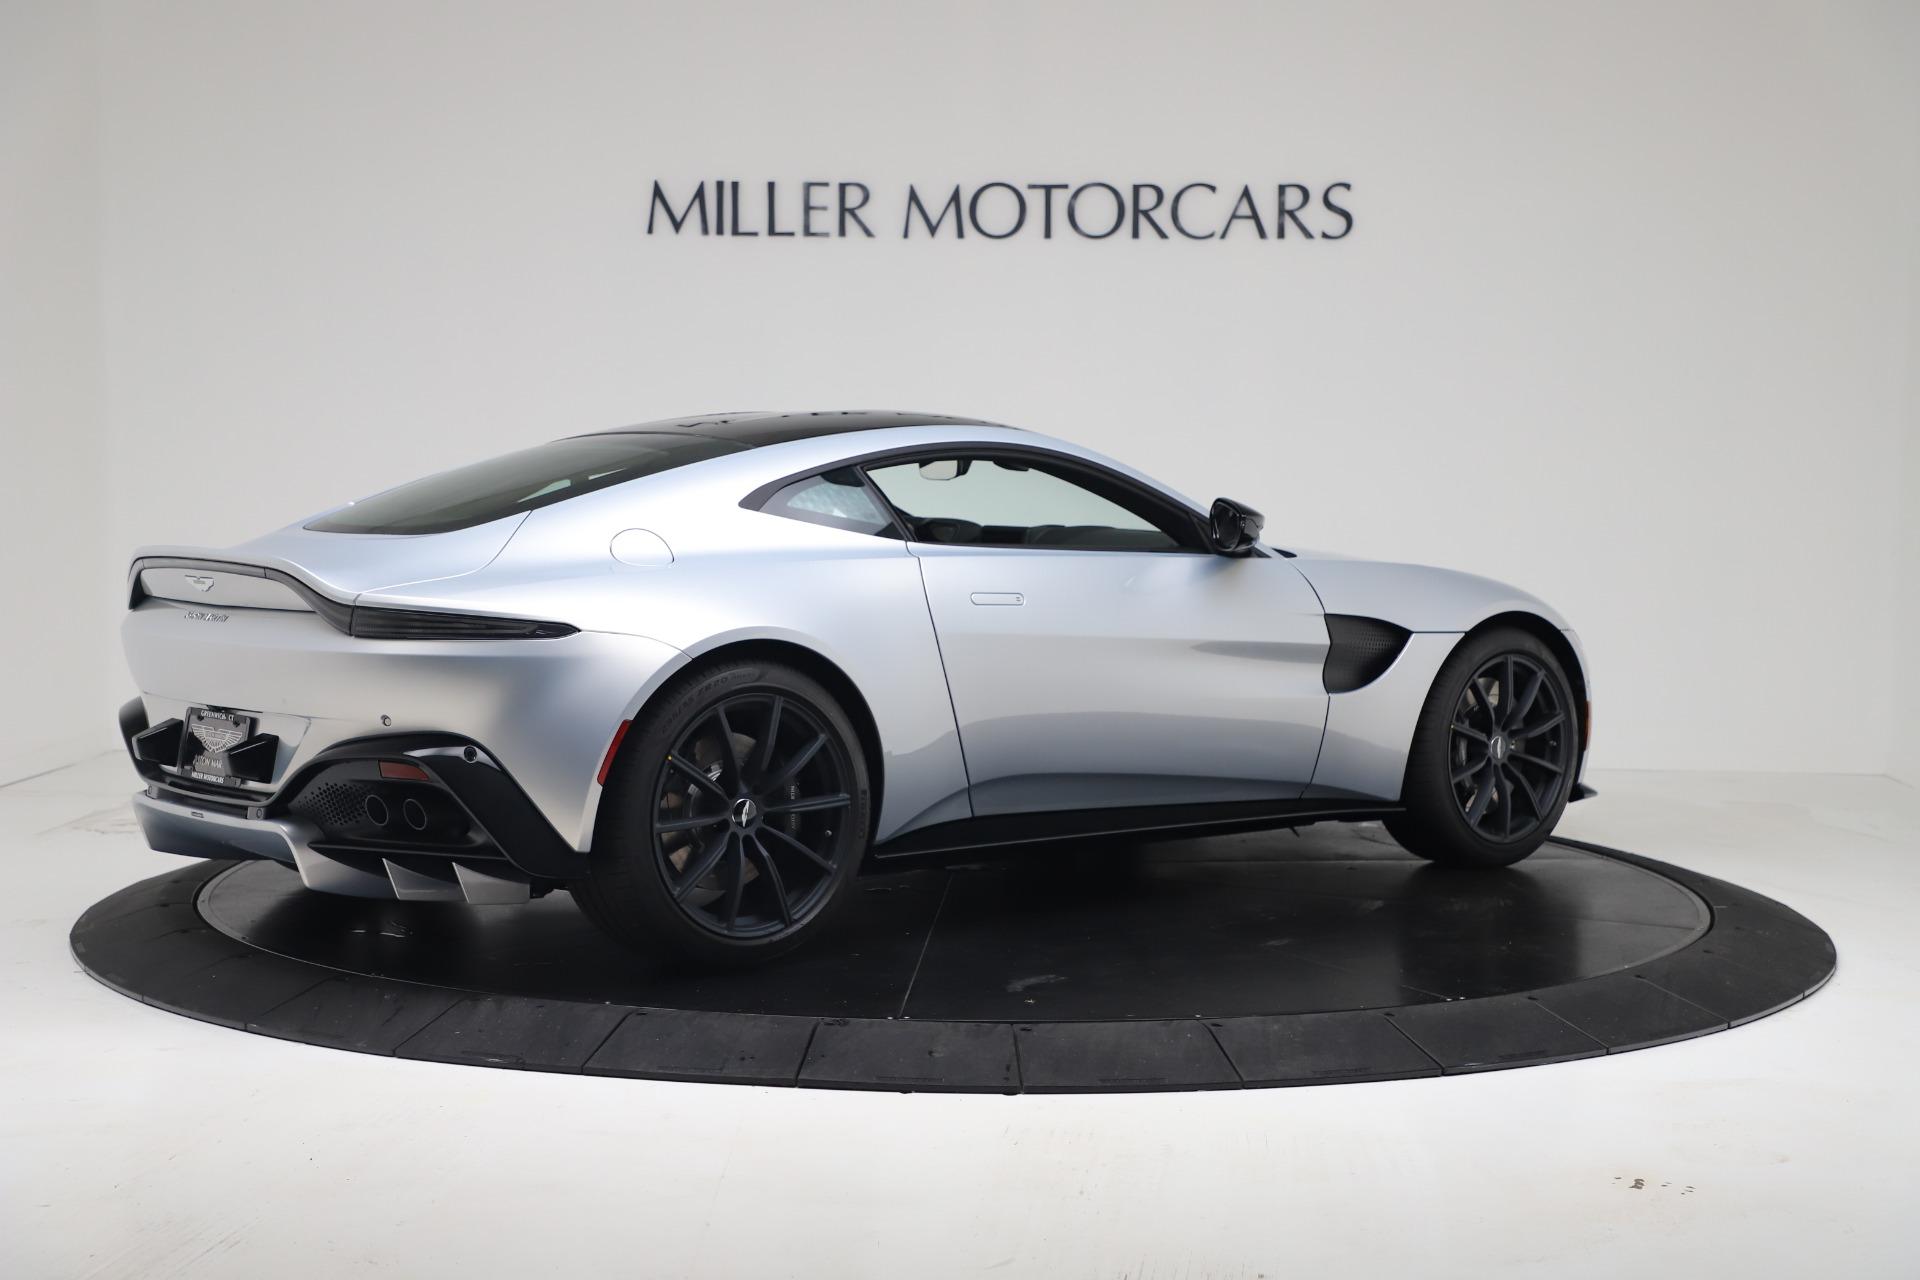 New 2020 Aston Martin Vantage V8 For Sale In Westport, CT 3481_p13